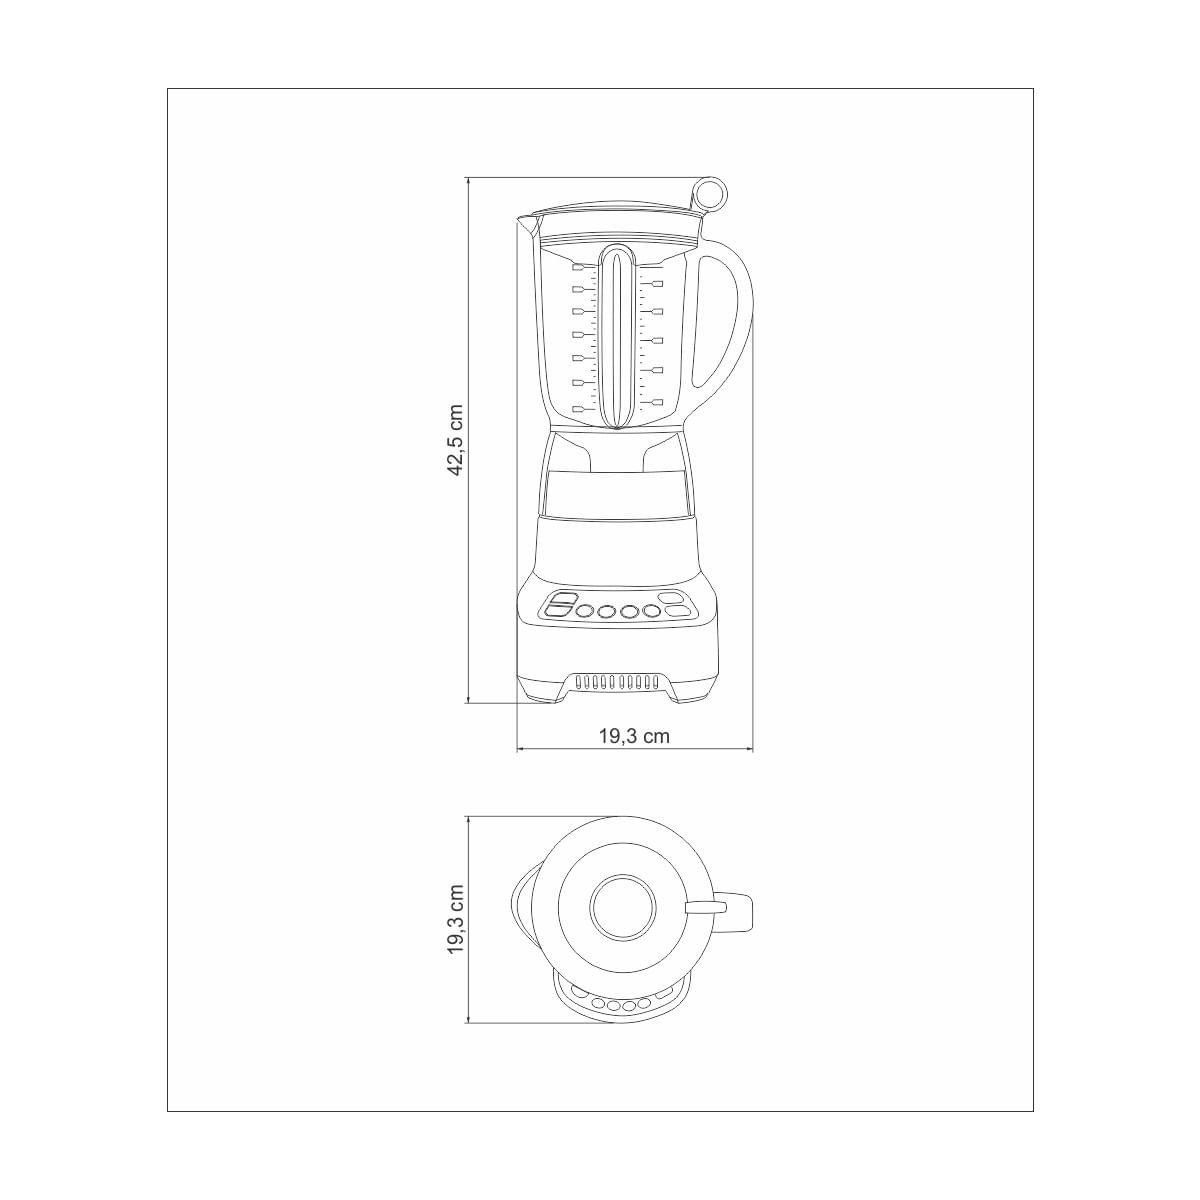 Liquidificador Tramontina by Breville Smart Twist em Alumínio Fundido Fosco com Copo de Tritan 1,4 L 800 W